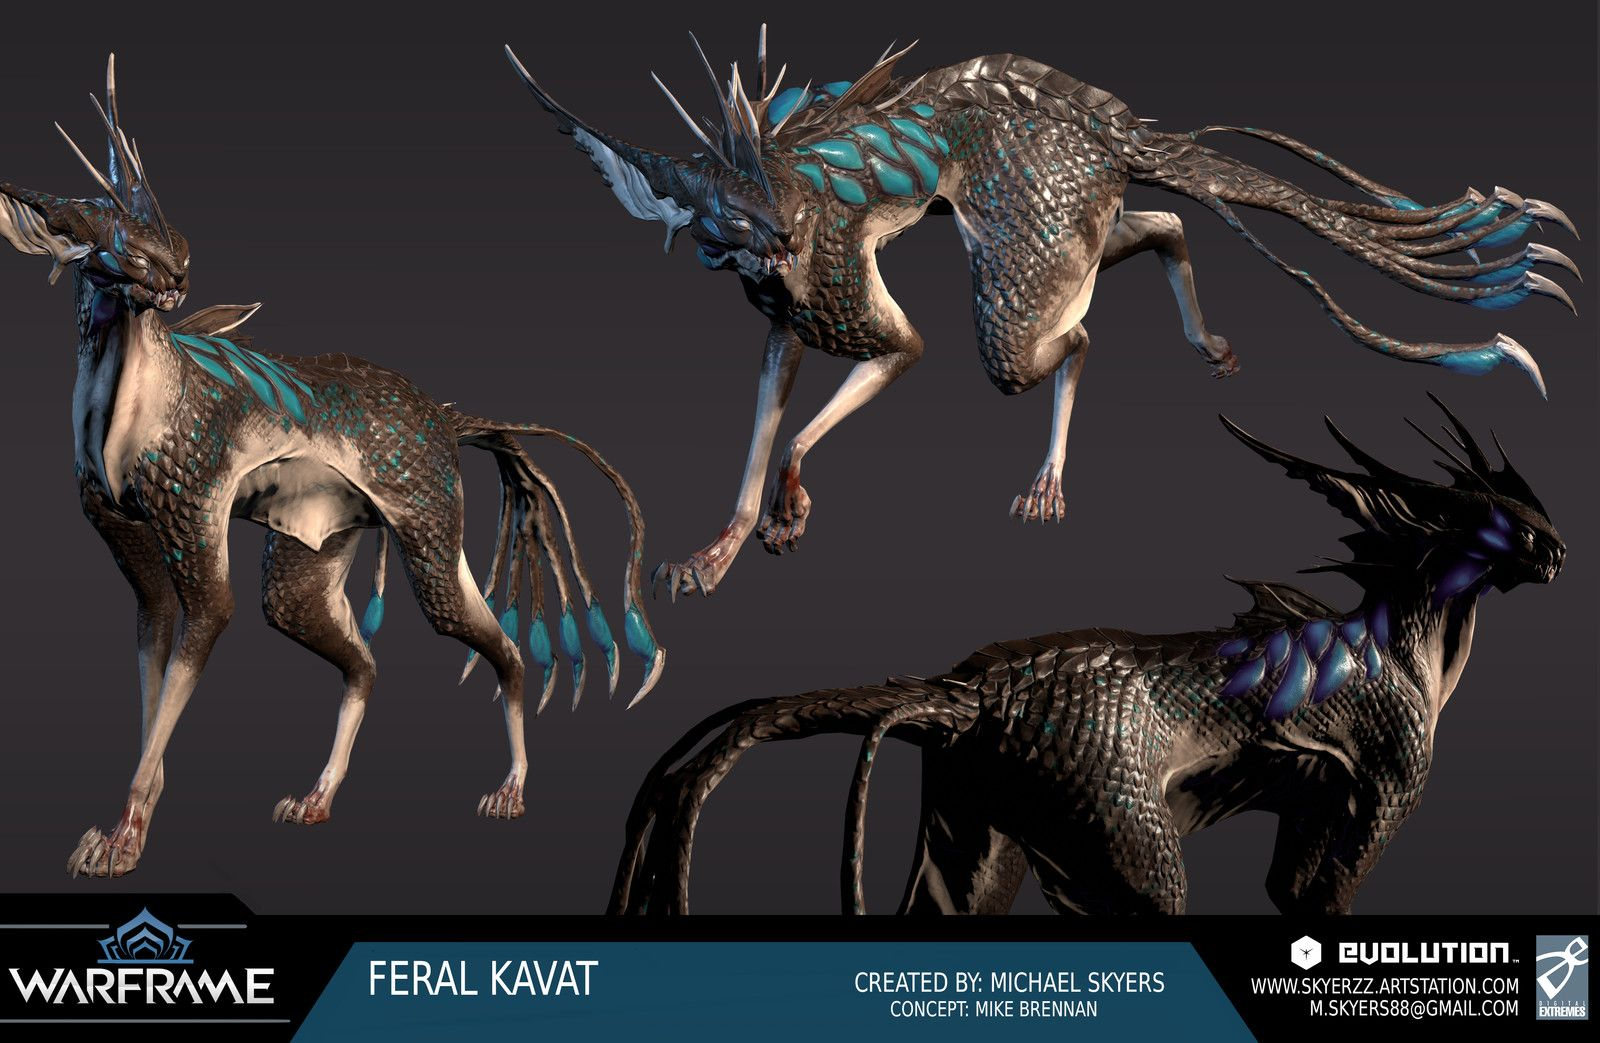 Warframe Feral Kavat Catbrow Michael Skyers On Artstation At Https Www Artstation Com Artwork Rw9mg Alien Creatures Creature Concept Art Fantasy Creatures